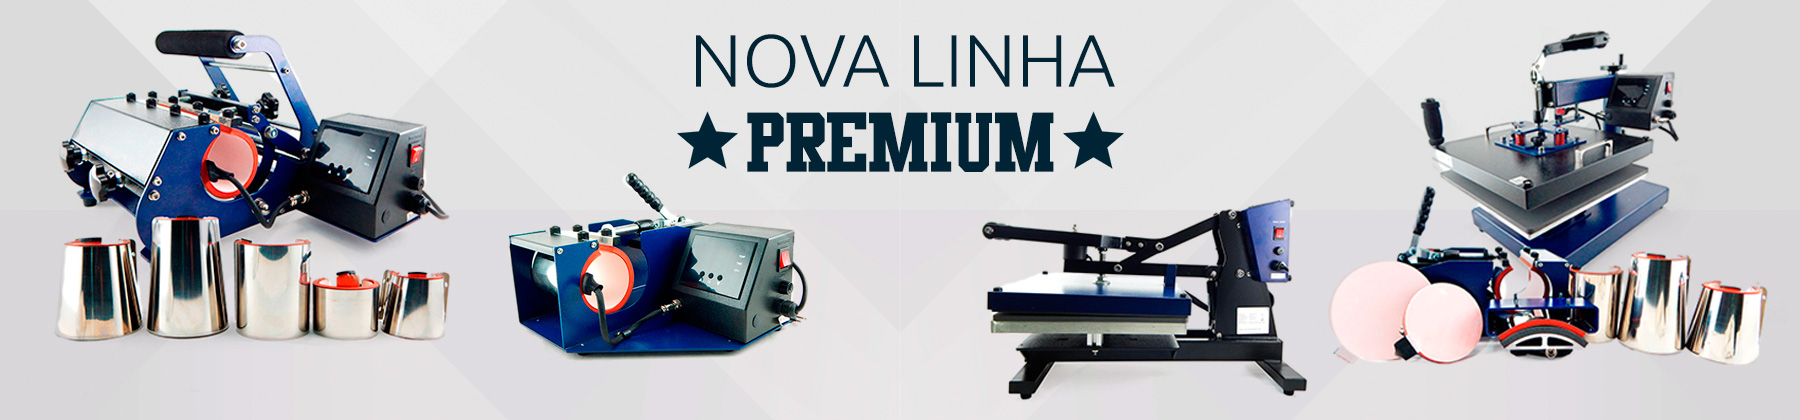 Prensa Premium